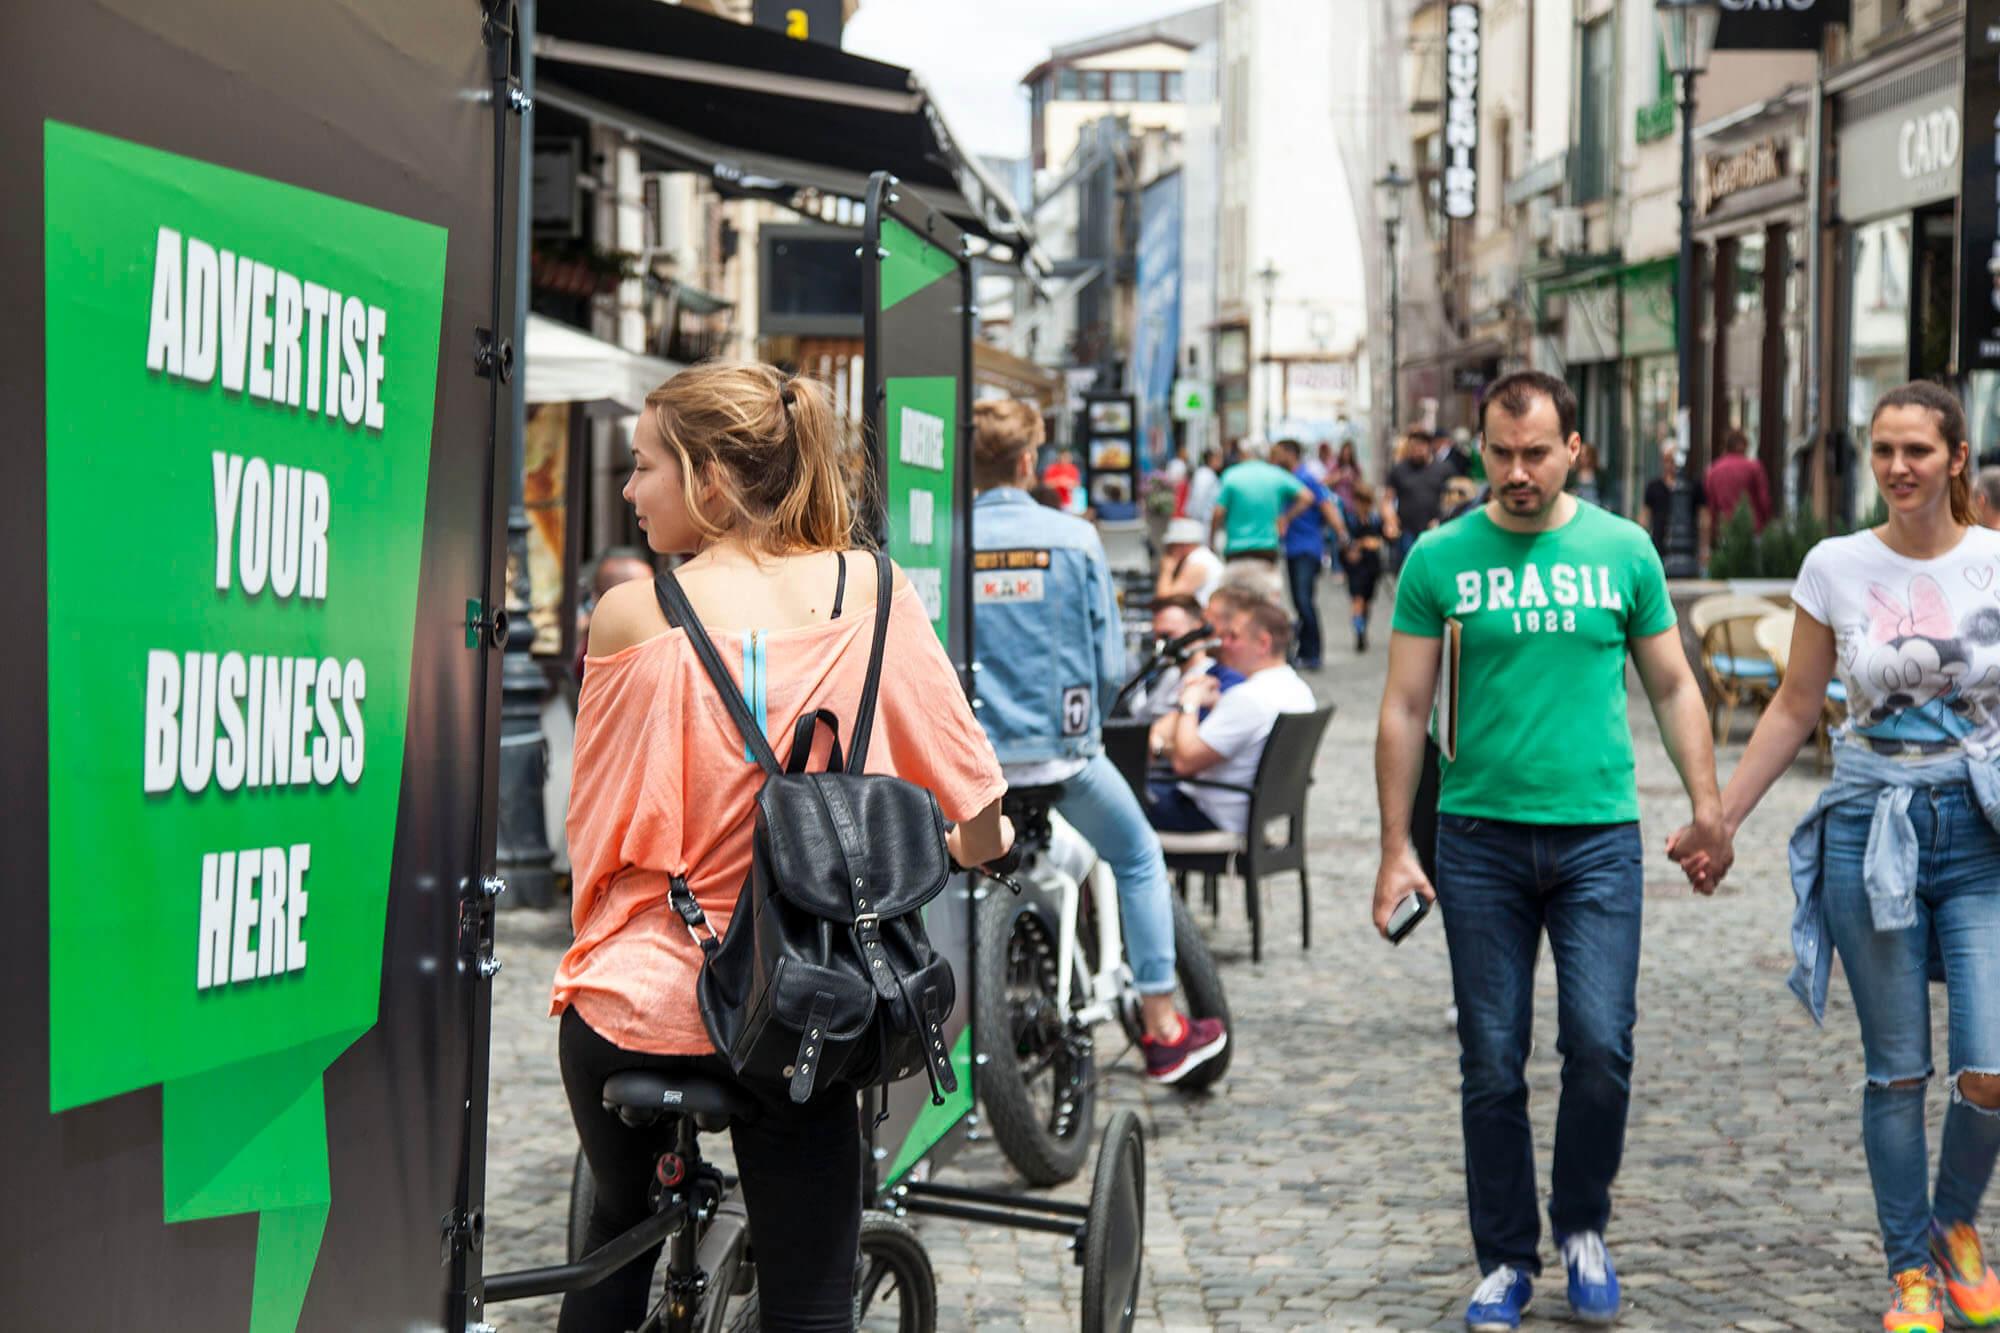 Bike billboard advertising campaign